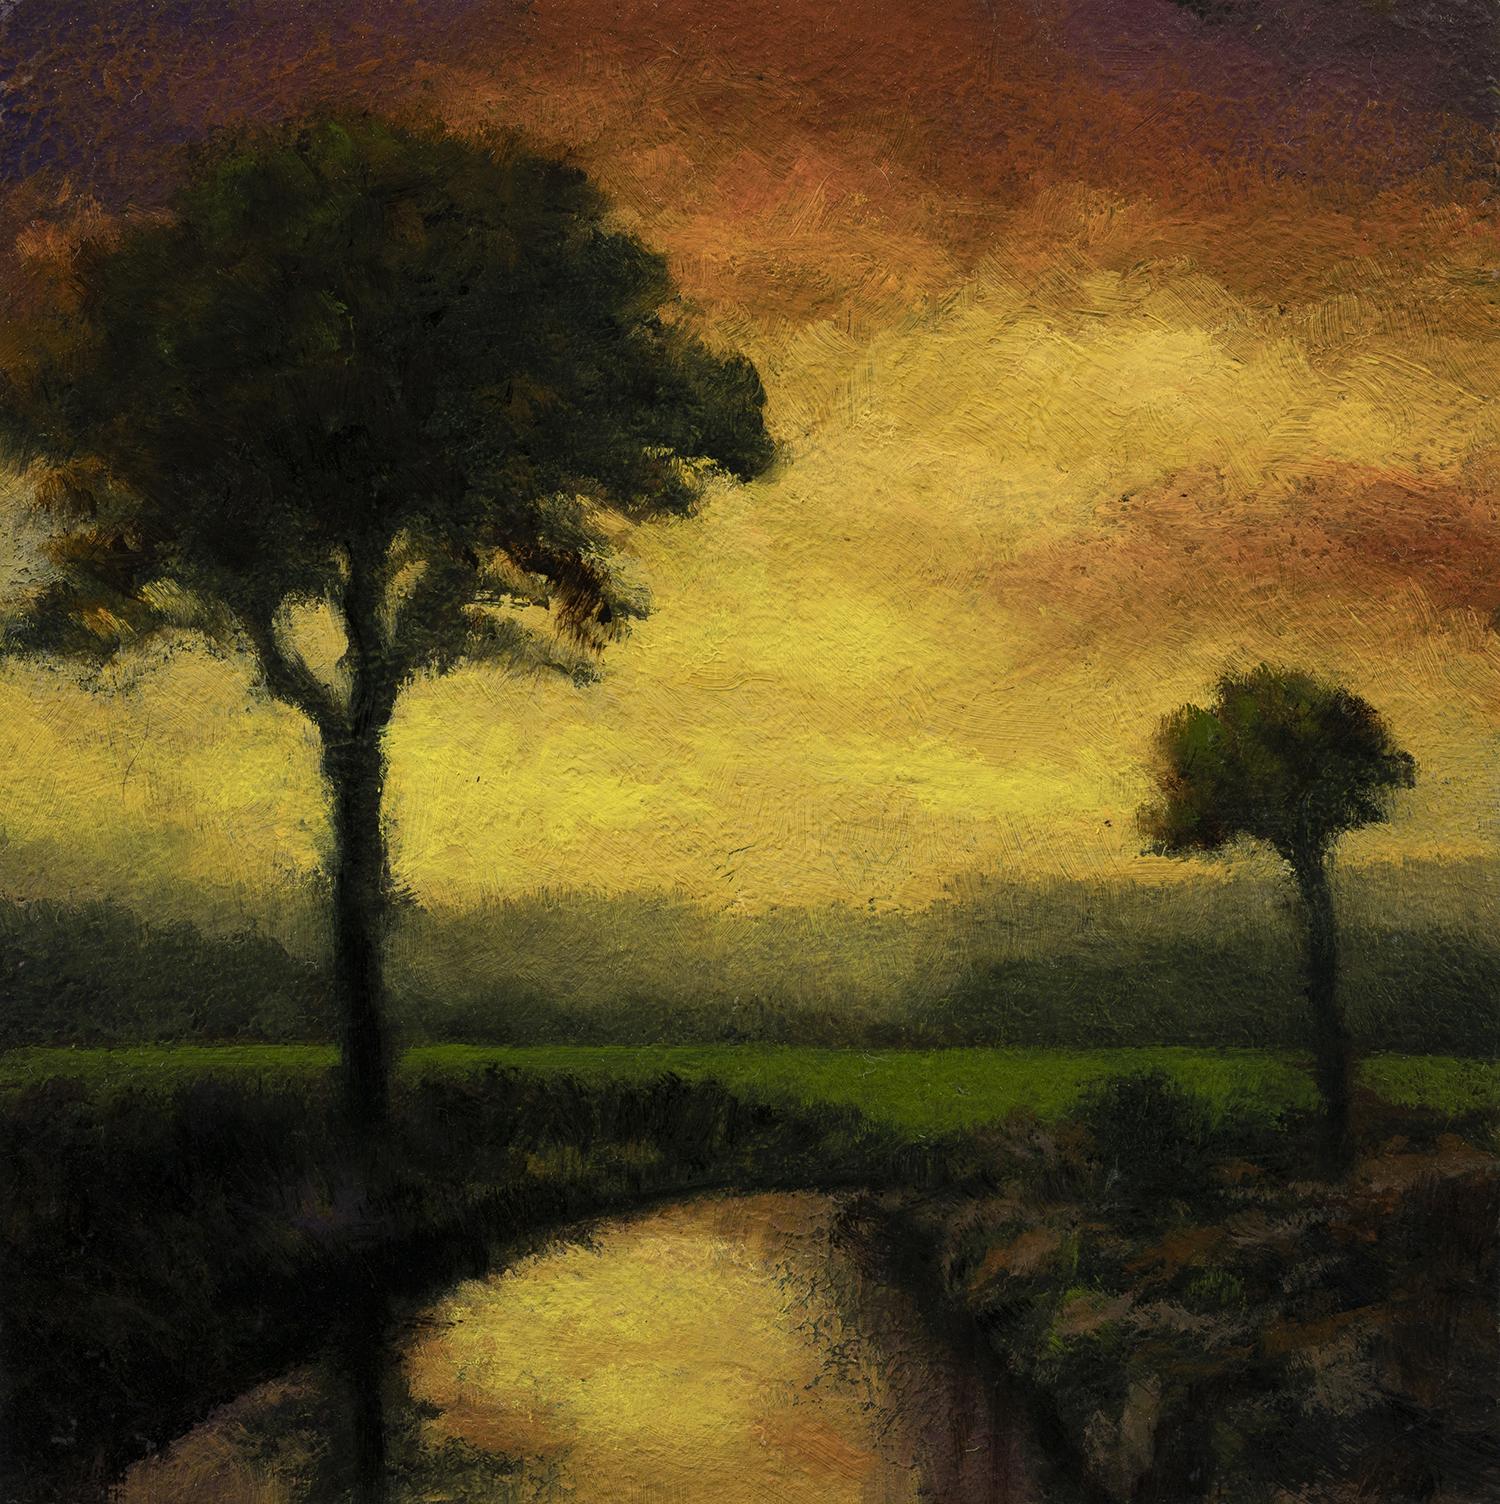 Twilight Stream by M Francis McCarthy - 5x5 Oil on Wood Panel